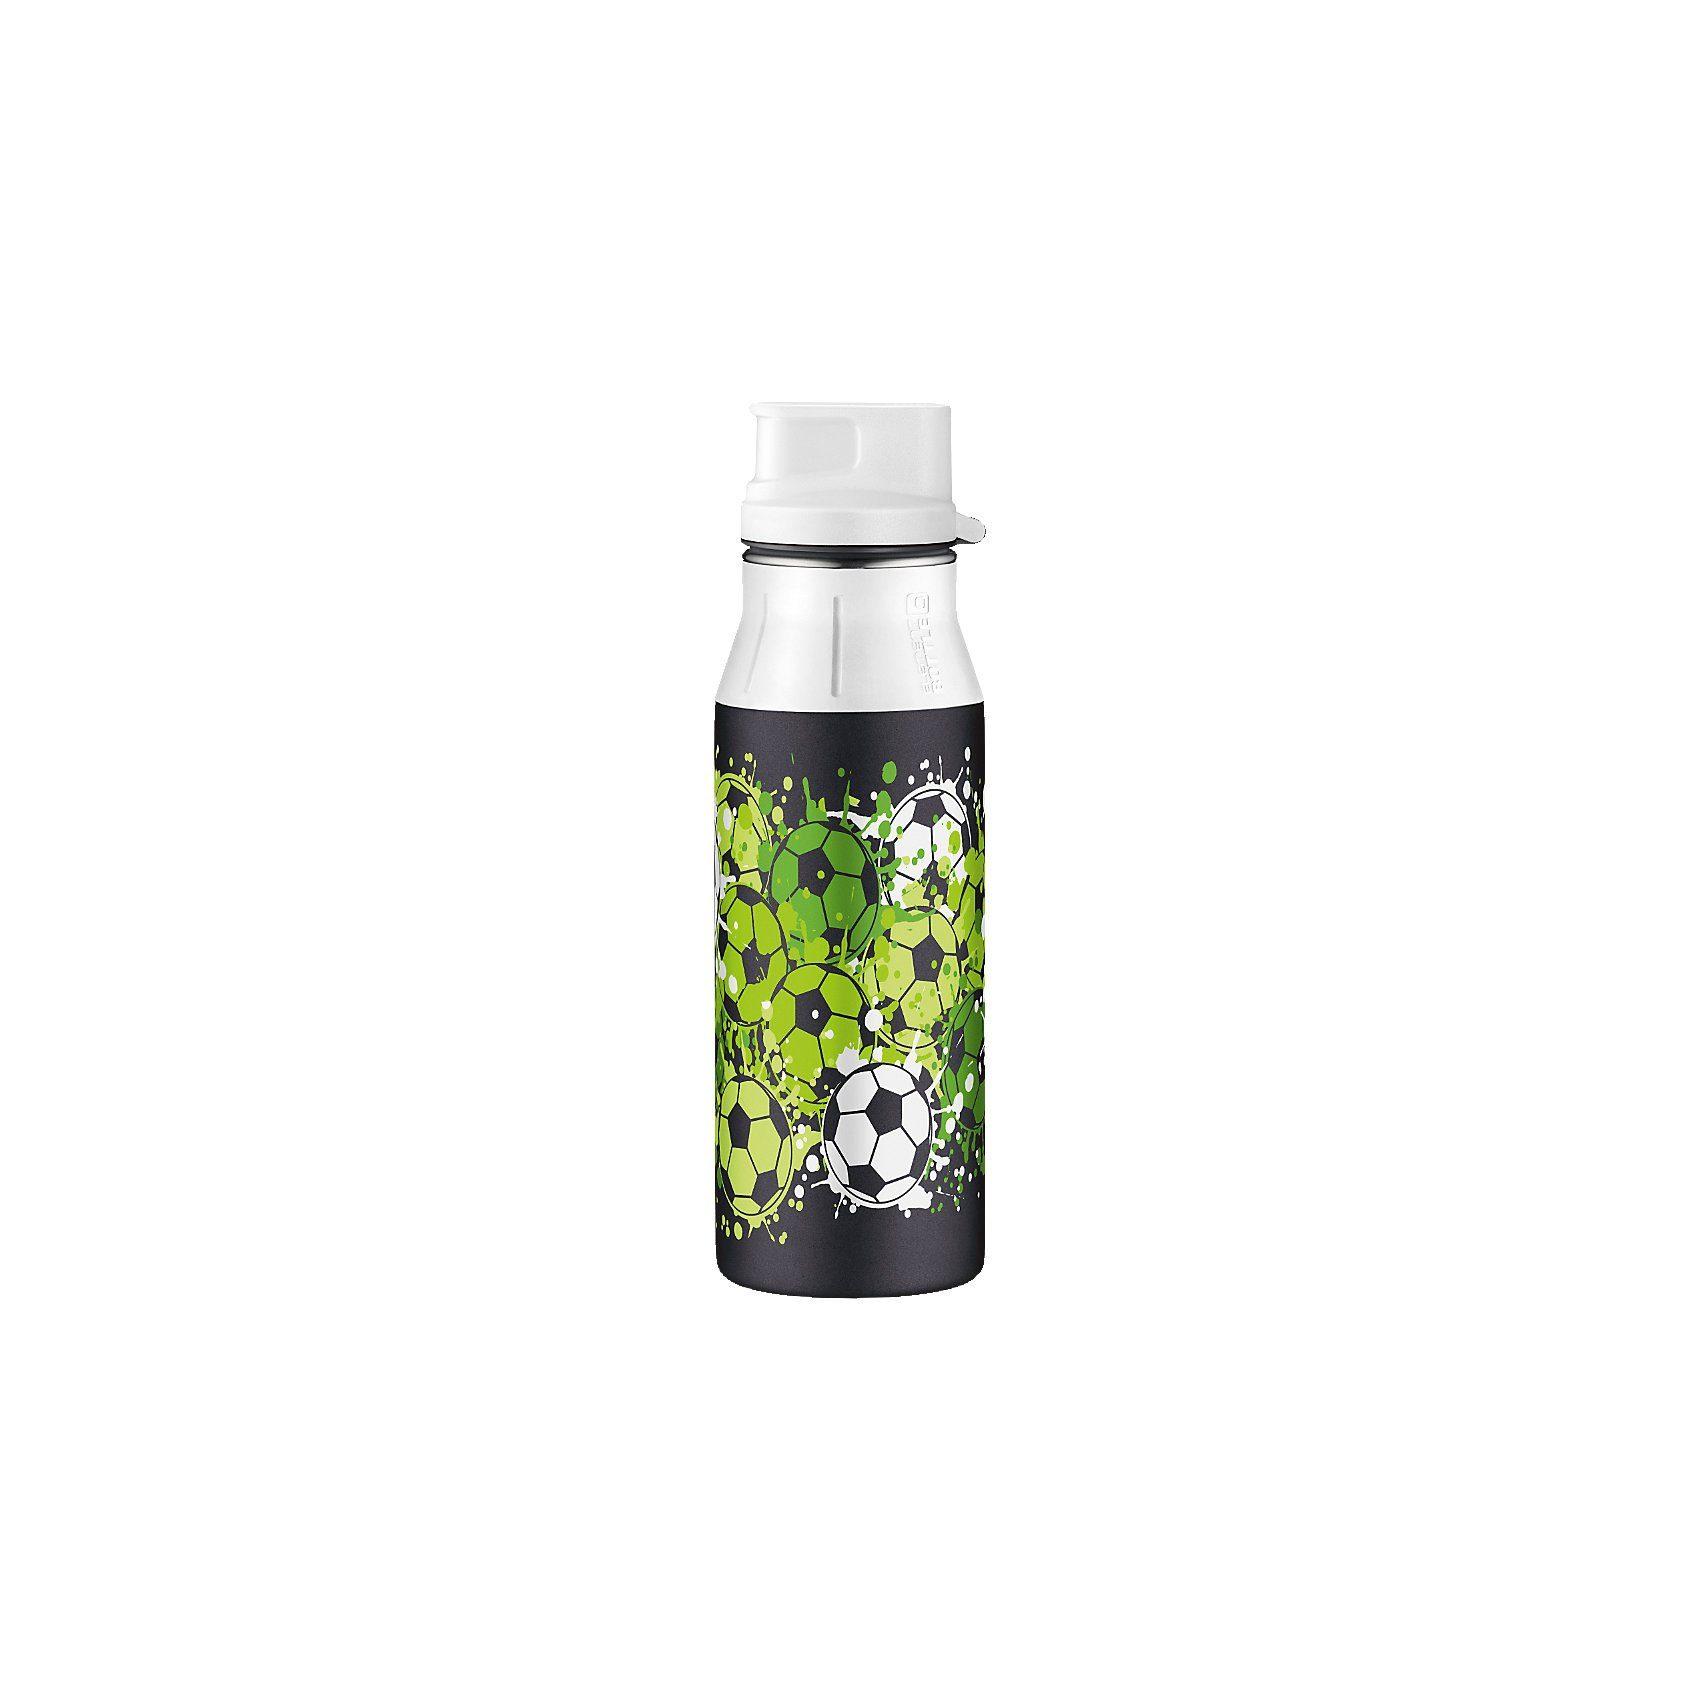 Alfi Trinkflasche elementBottle Soccer Green, 600 ml